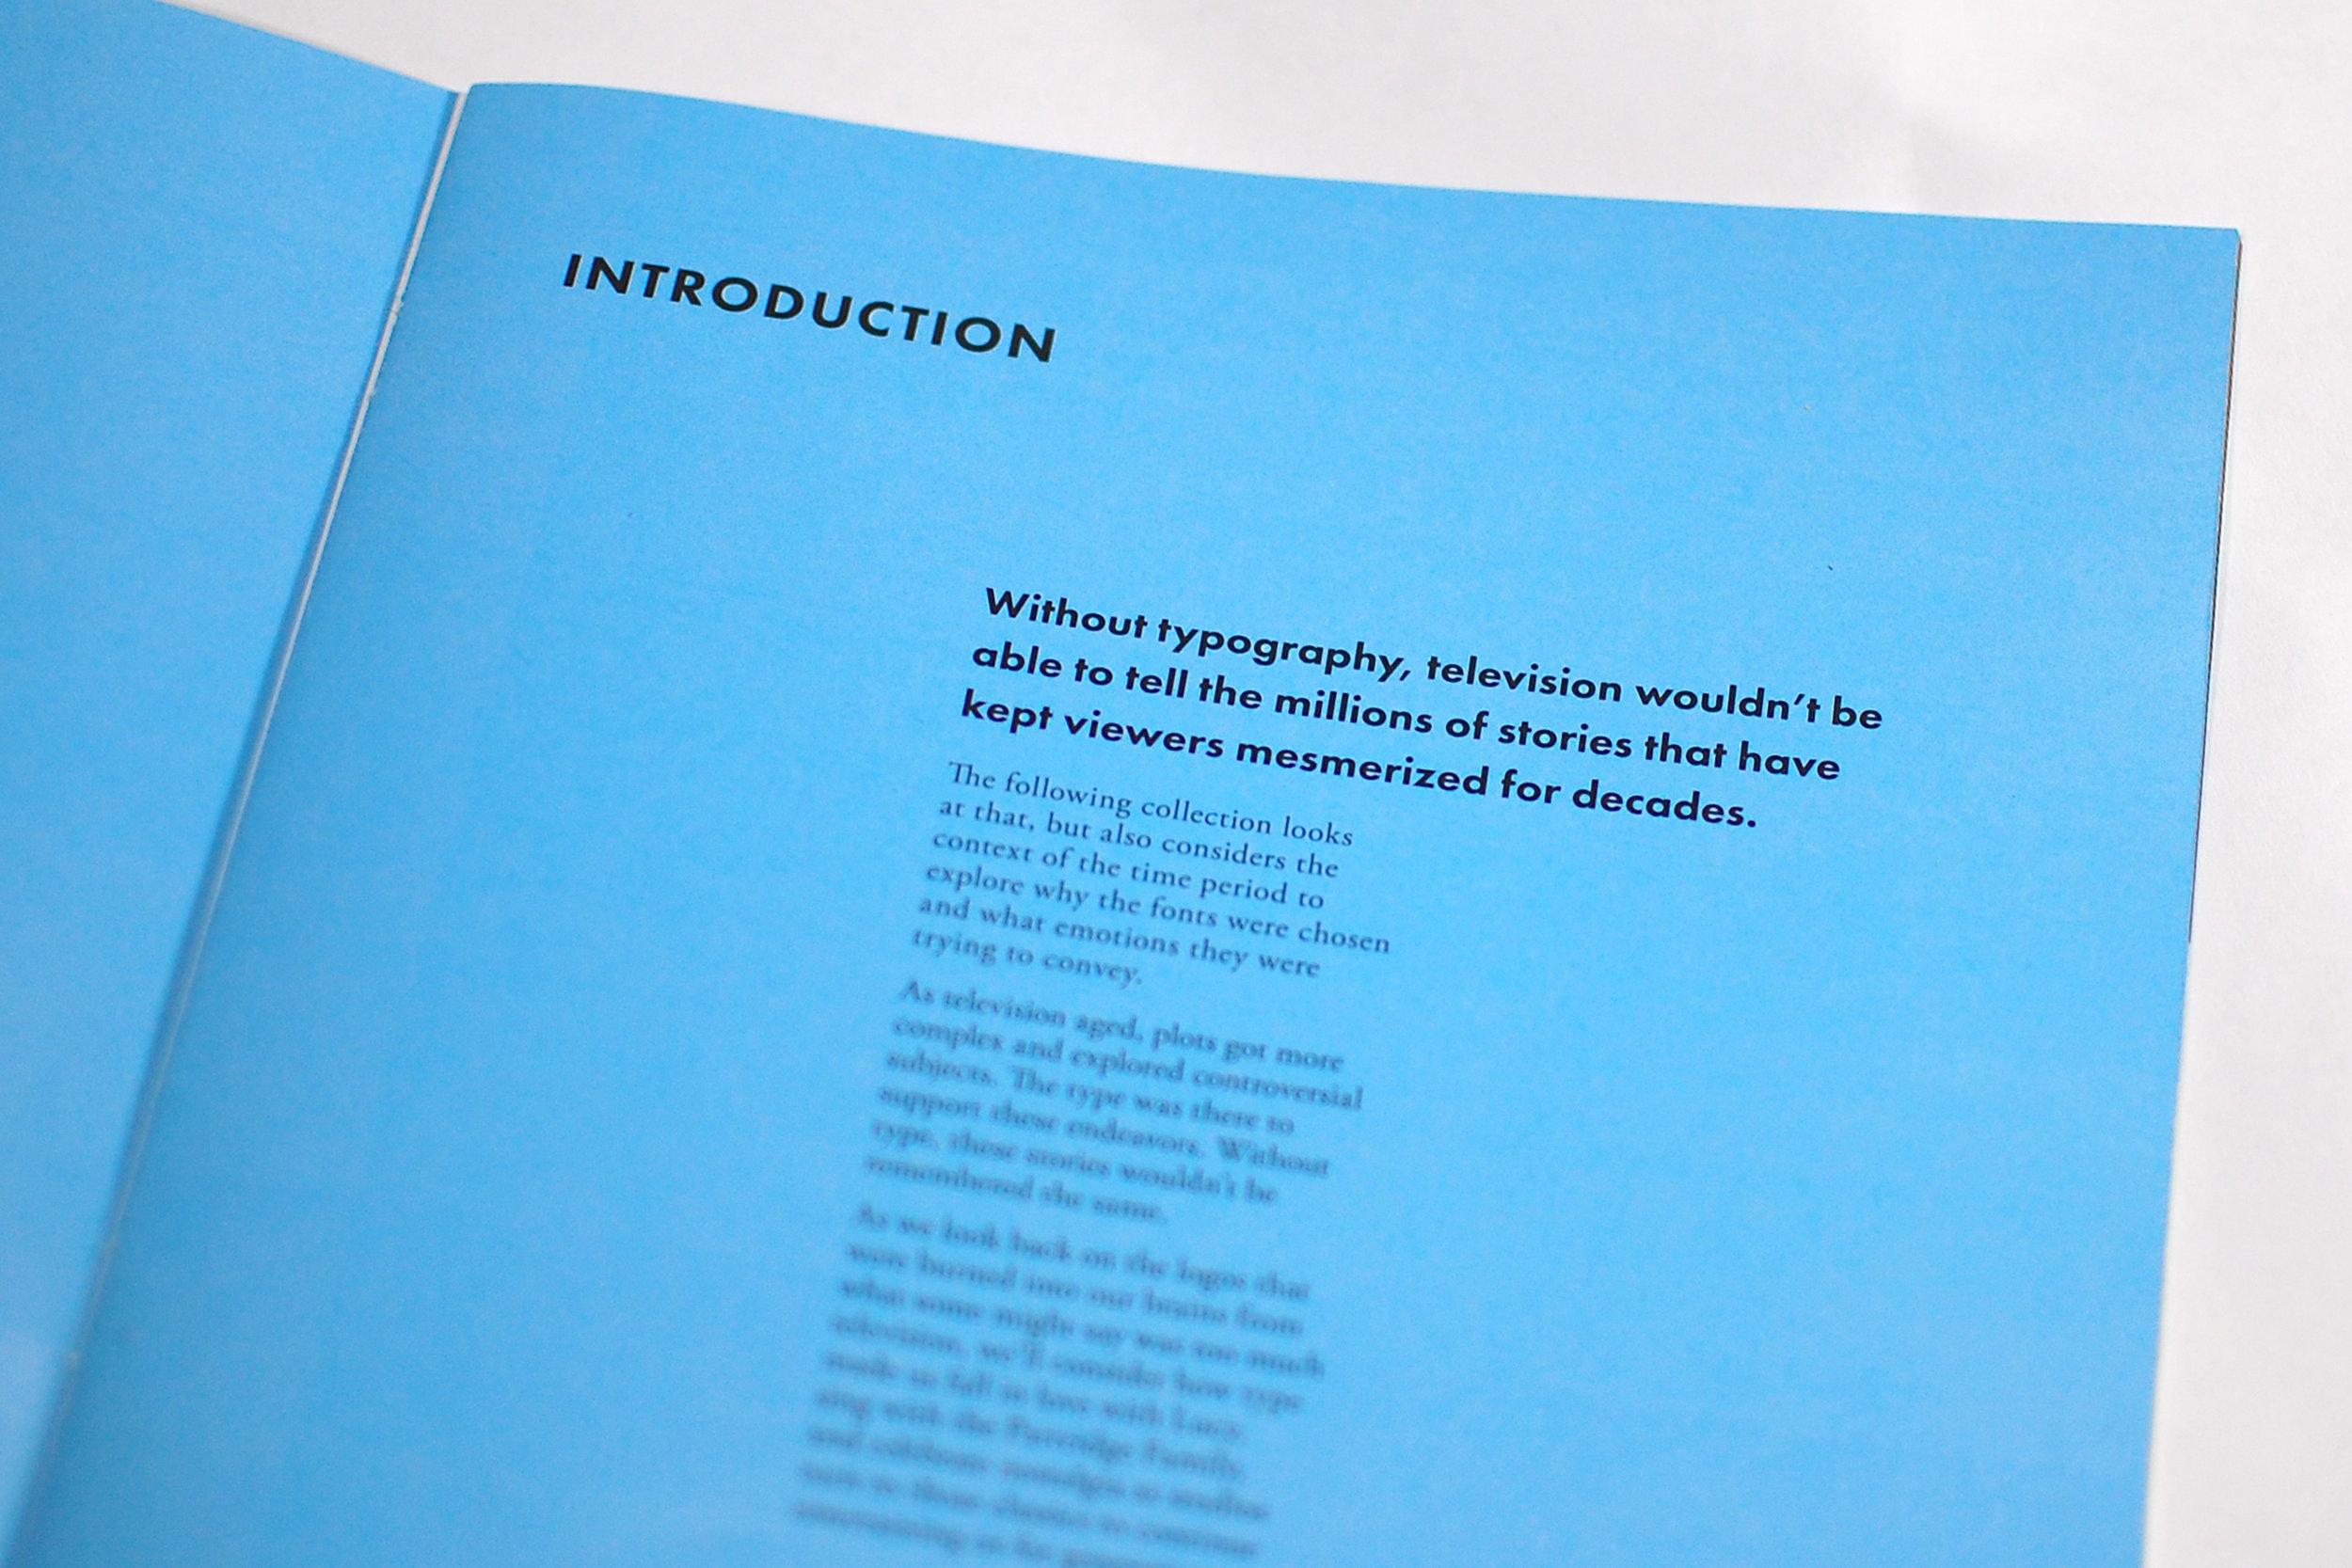 5_Introduction_TvType.jpg